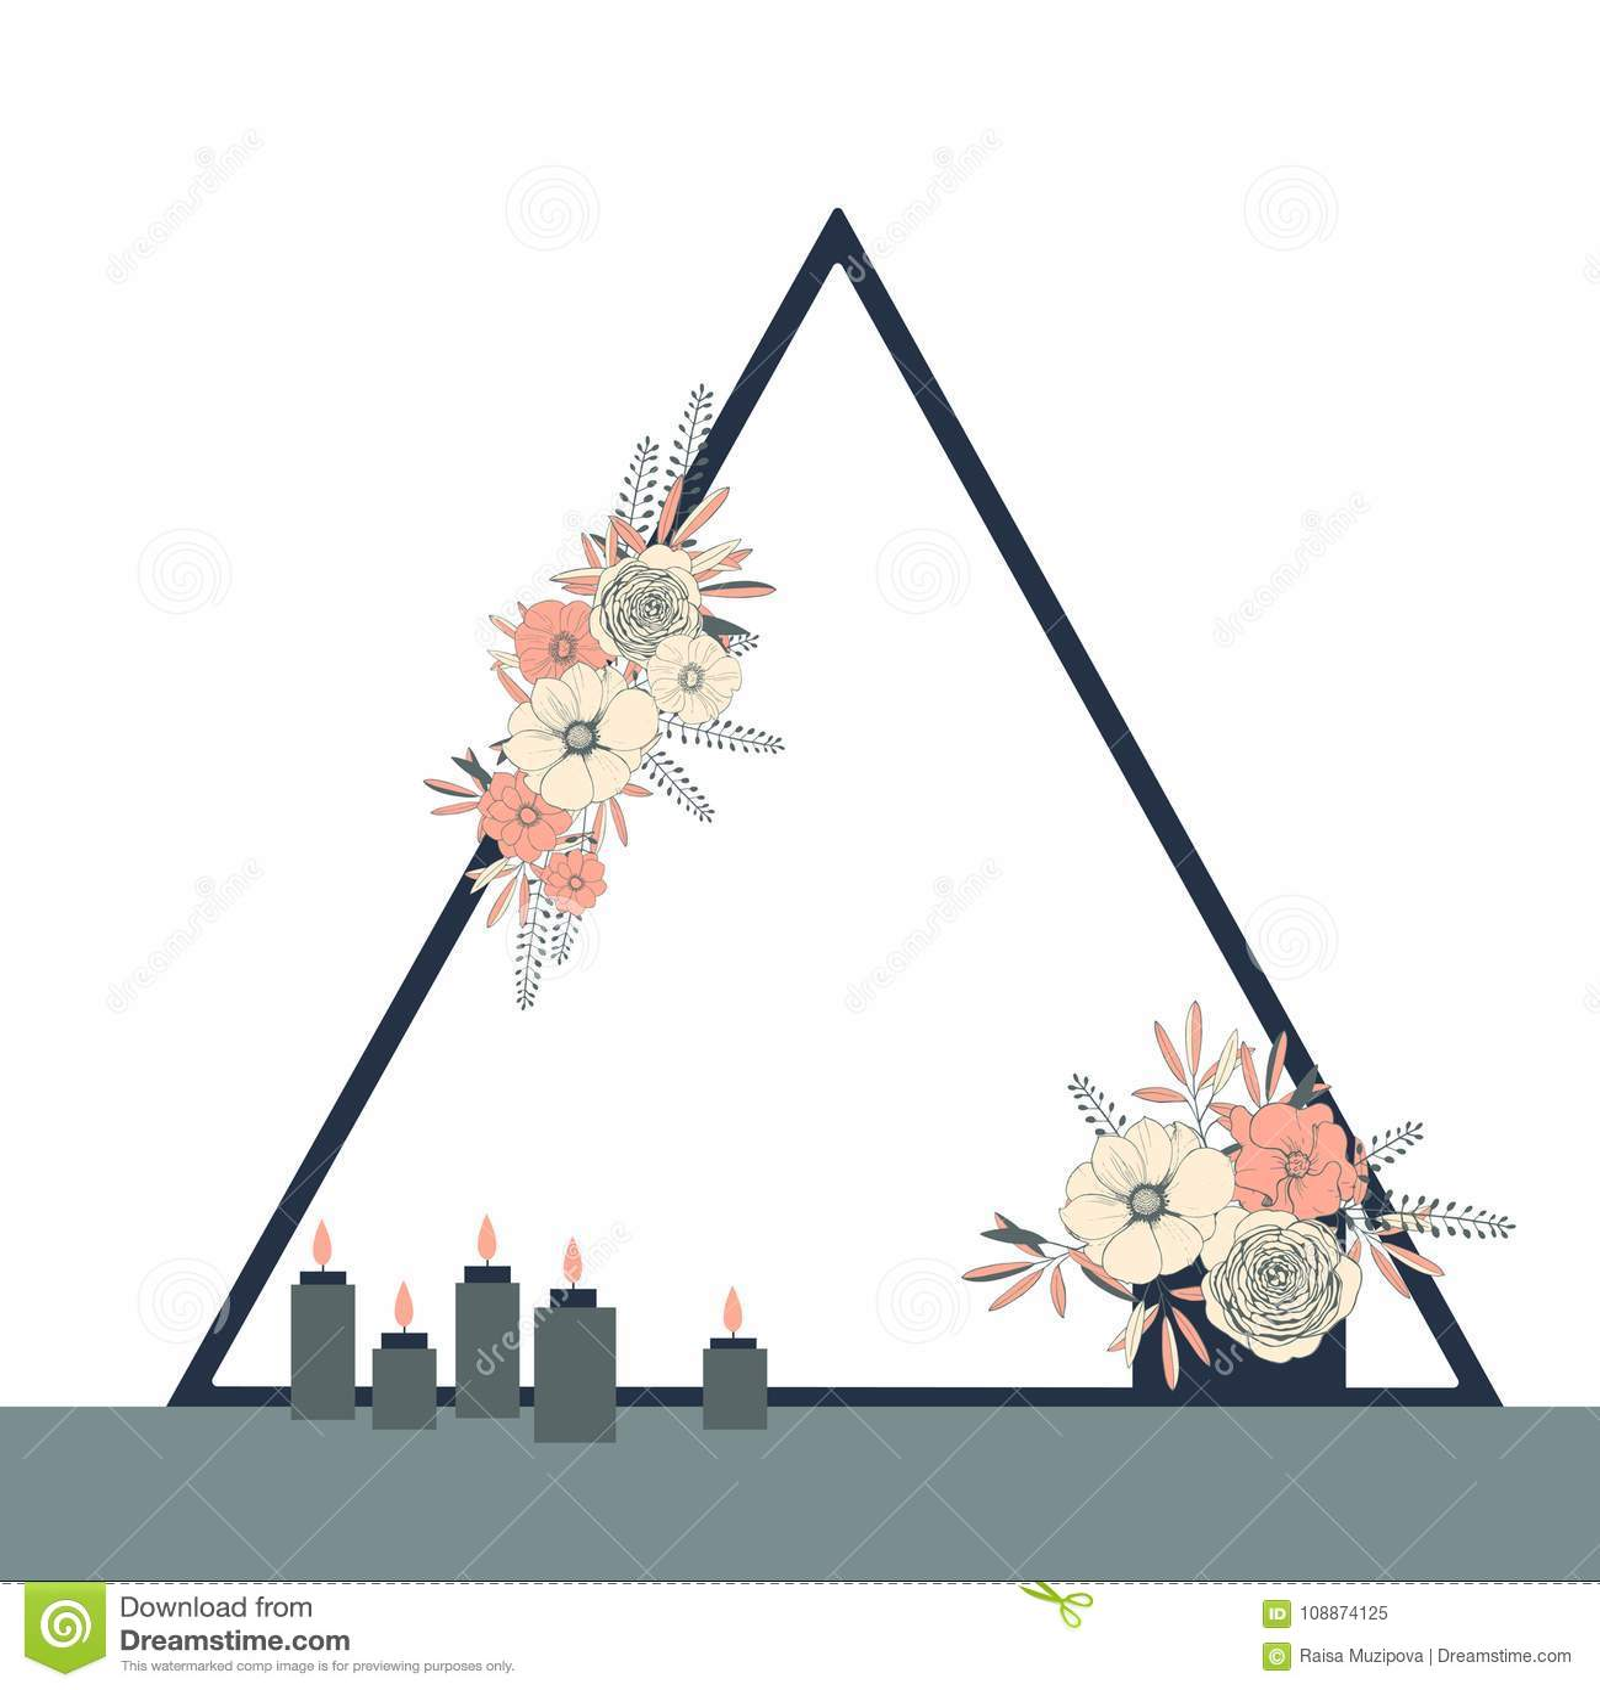 Triangle Wedding Arch: Garden Arch Flowers Stock Illustrations